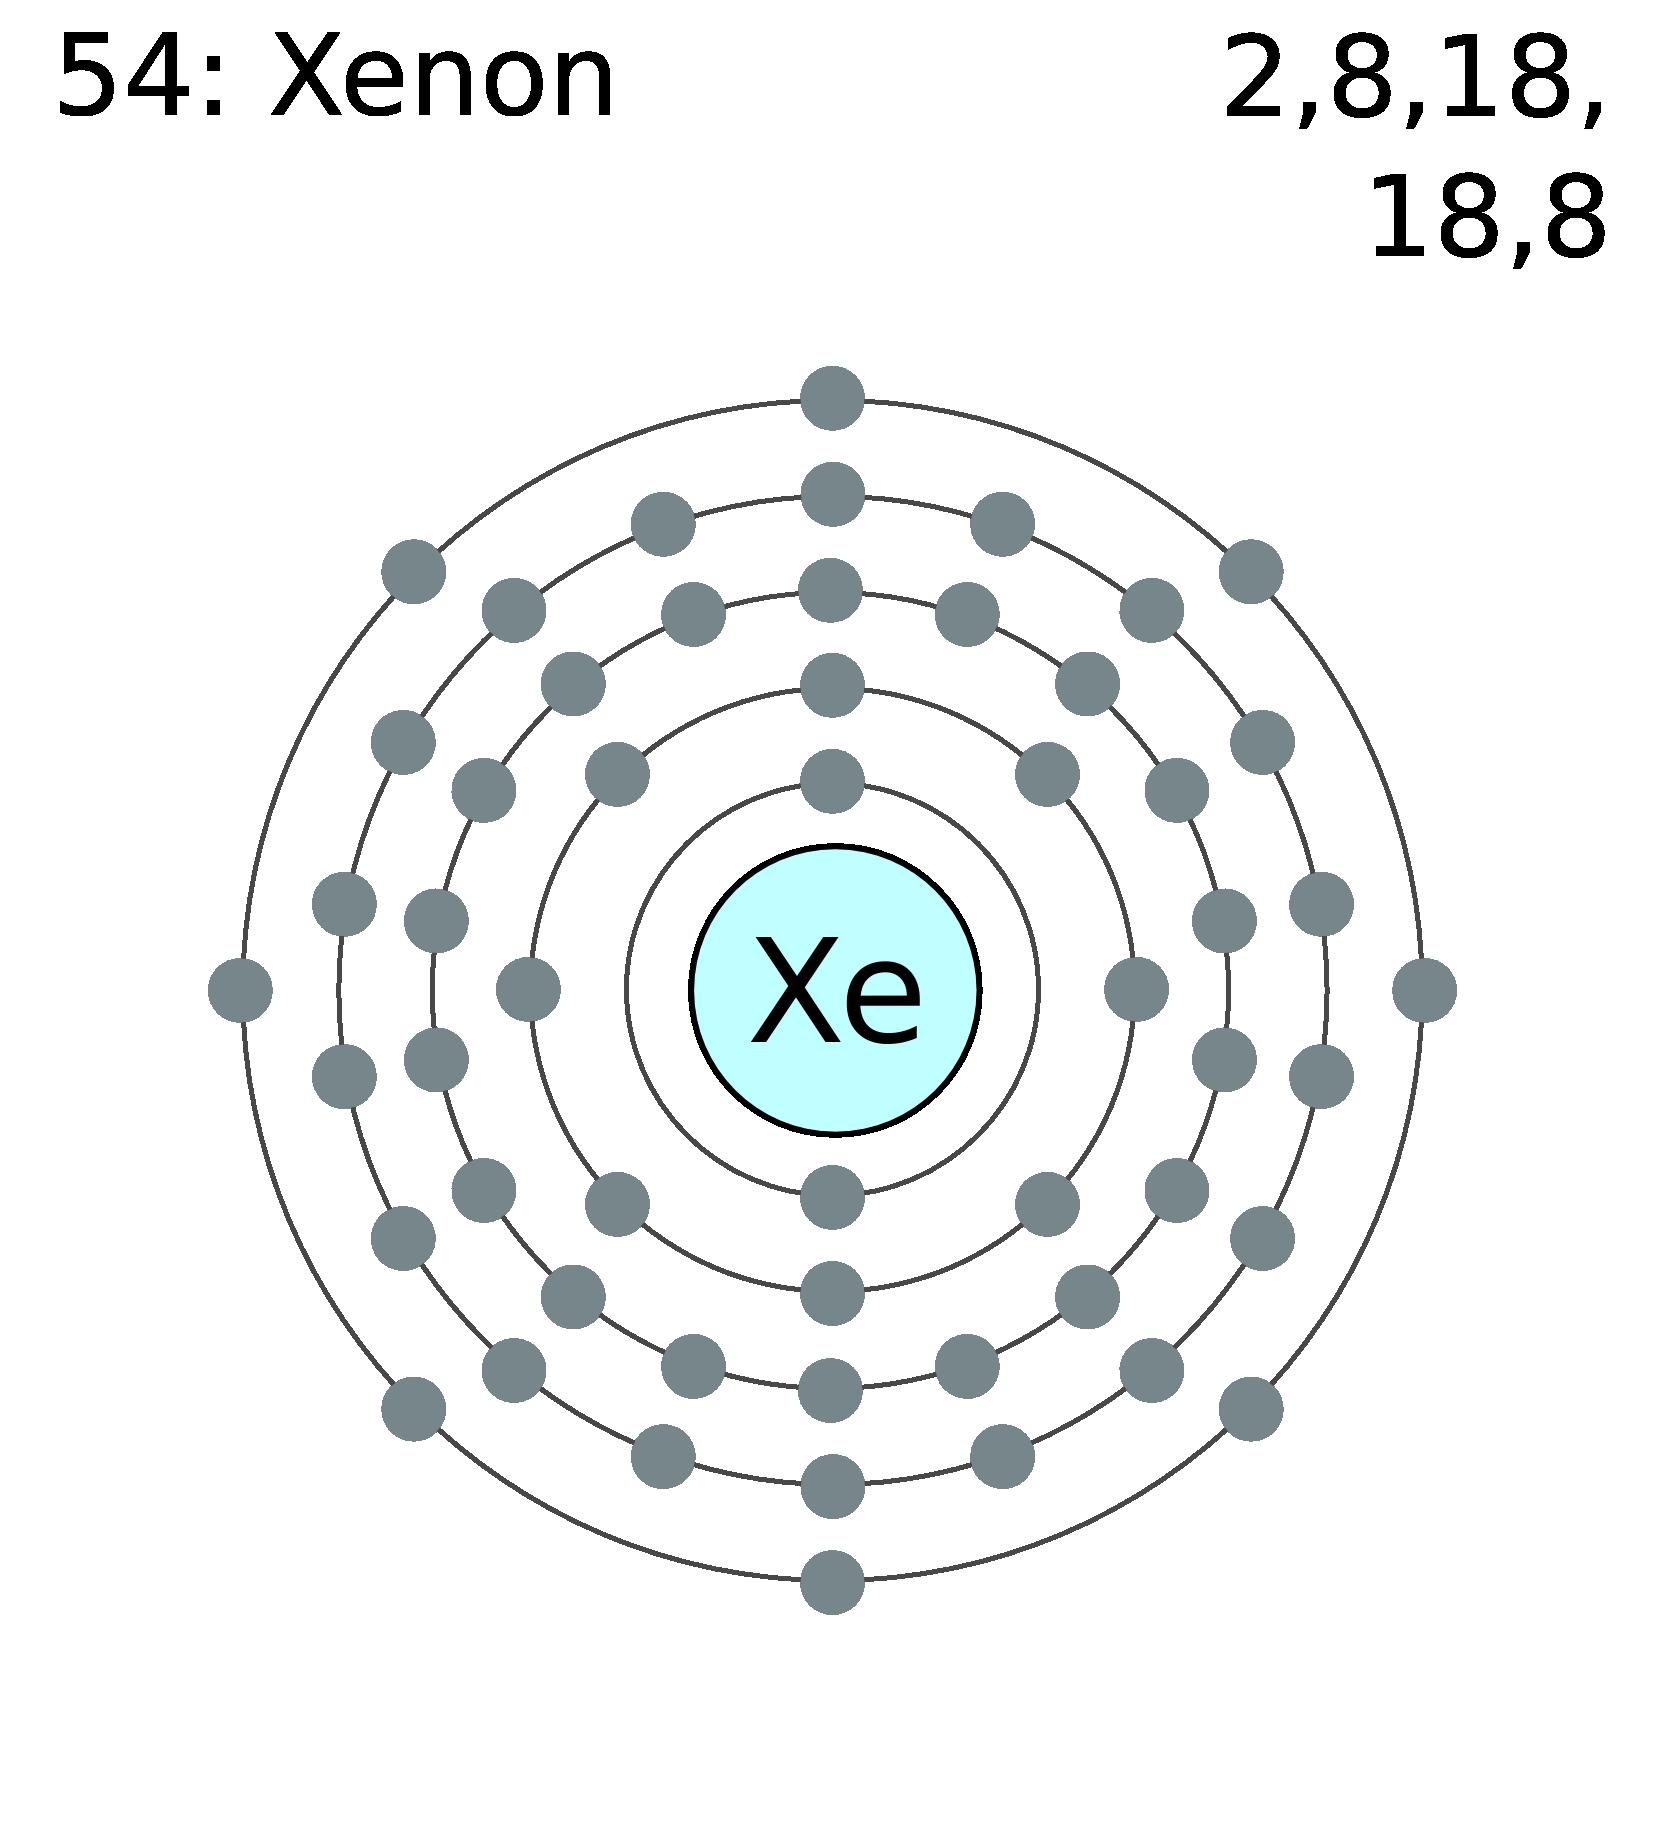 Electron_shell_054_xenon file electron shell 054 xenon png wikimedia commons xenon diatomic at nearapp.co